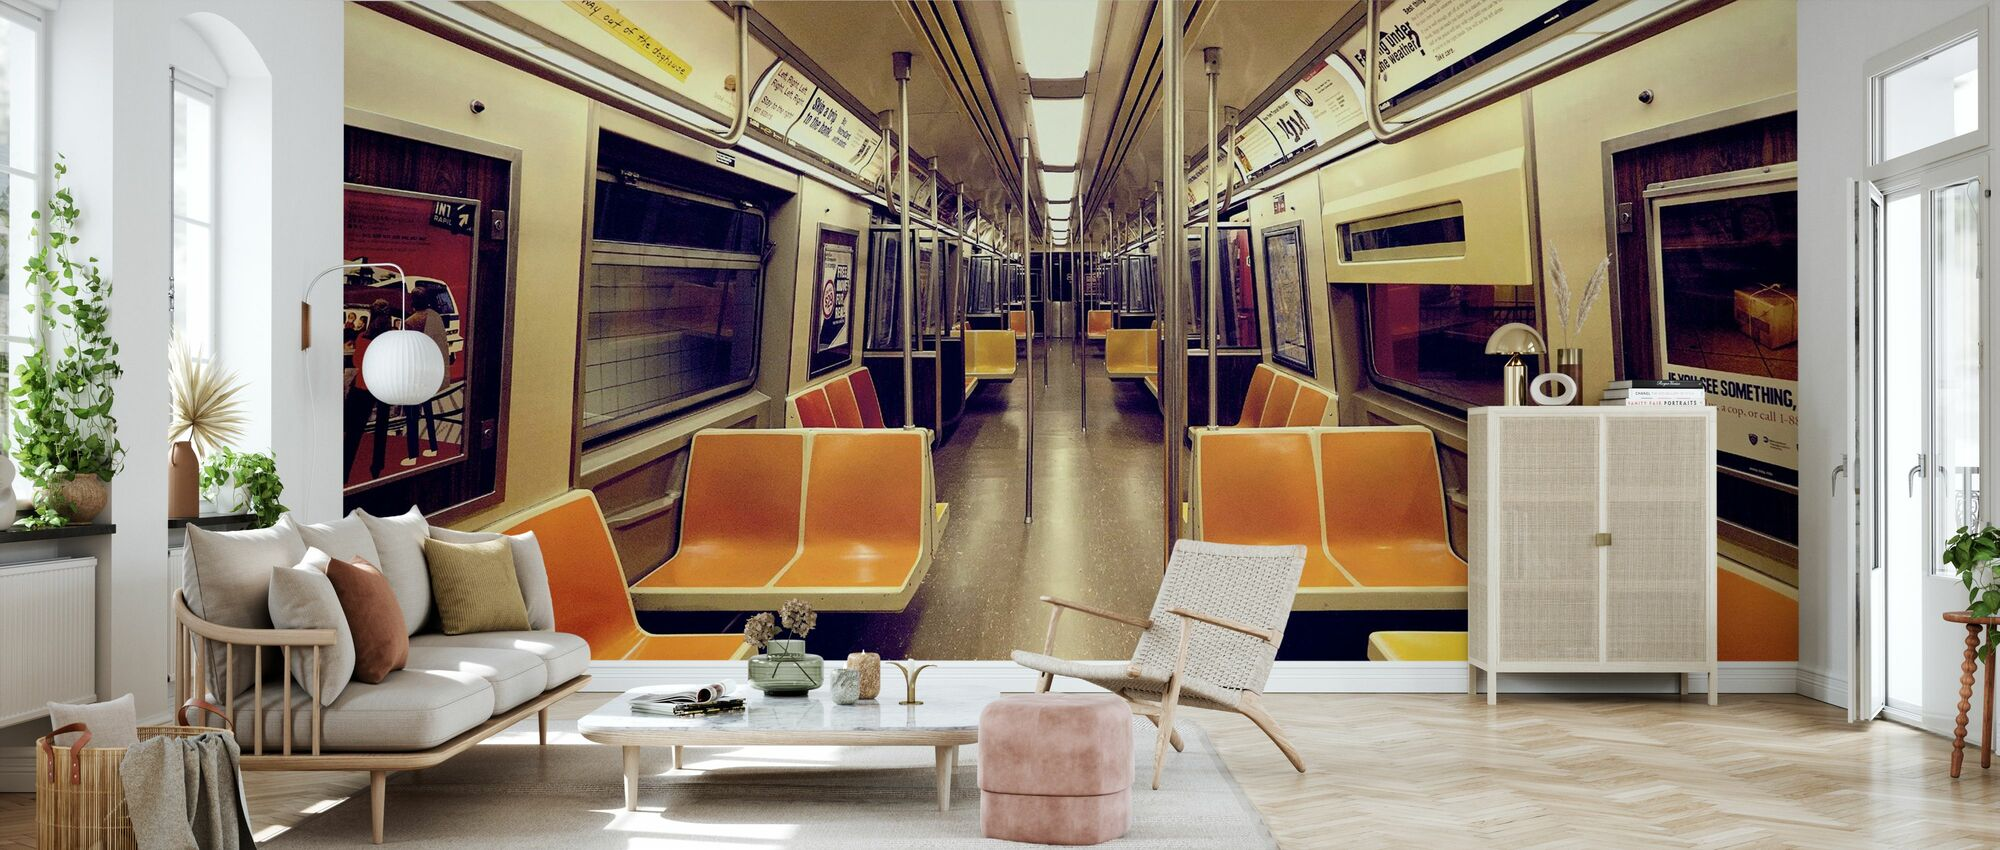 Soul Train - Wallpaper - Living Room